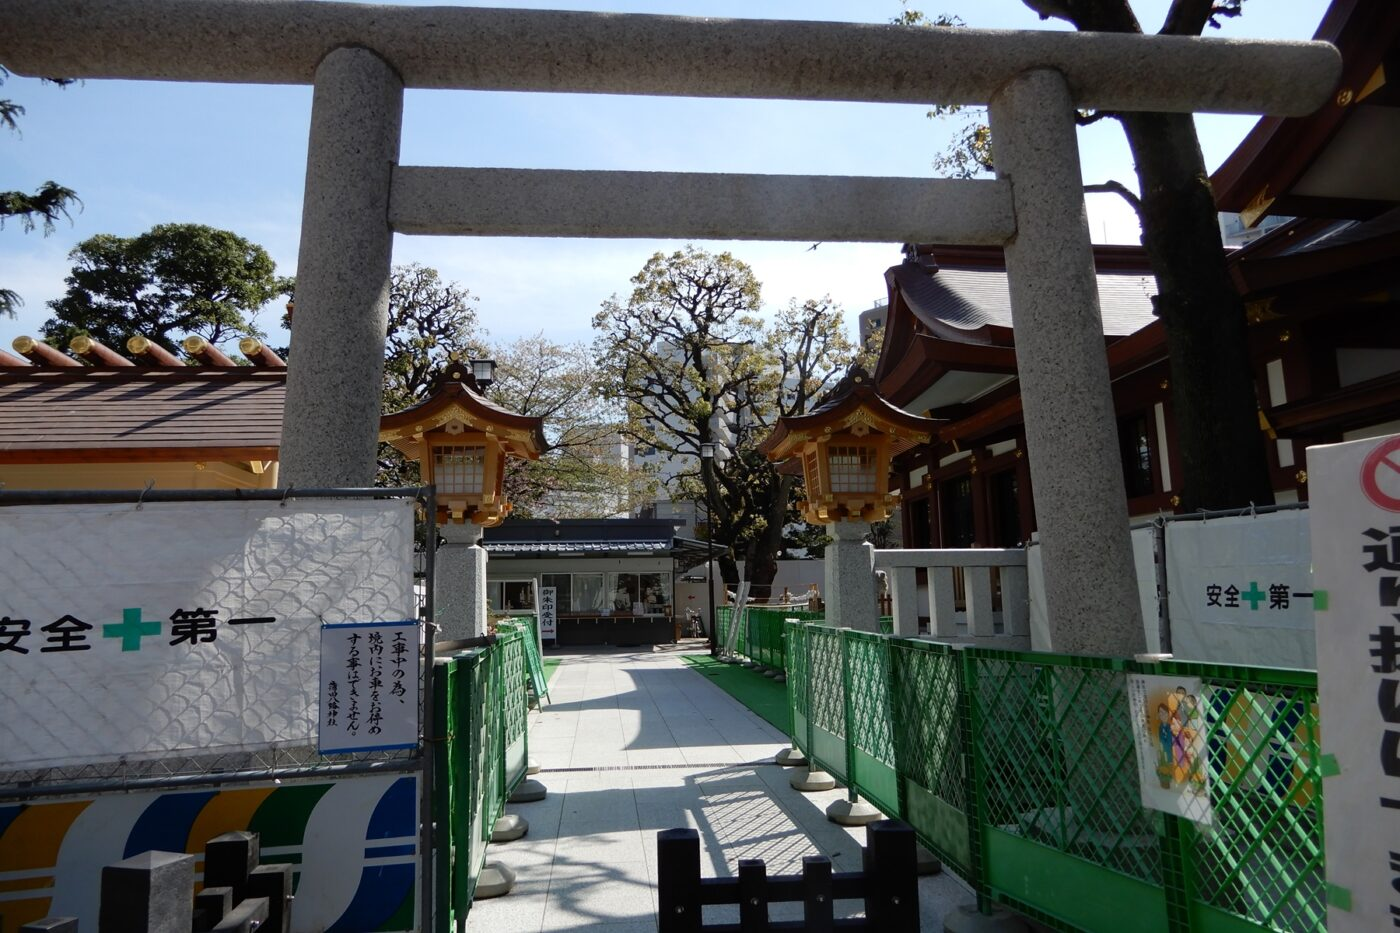 蒲田八幡神社の写真